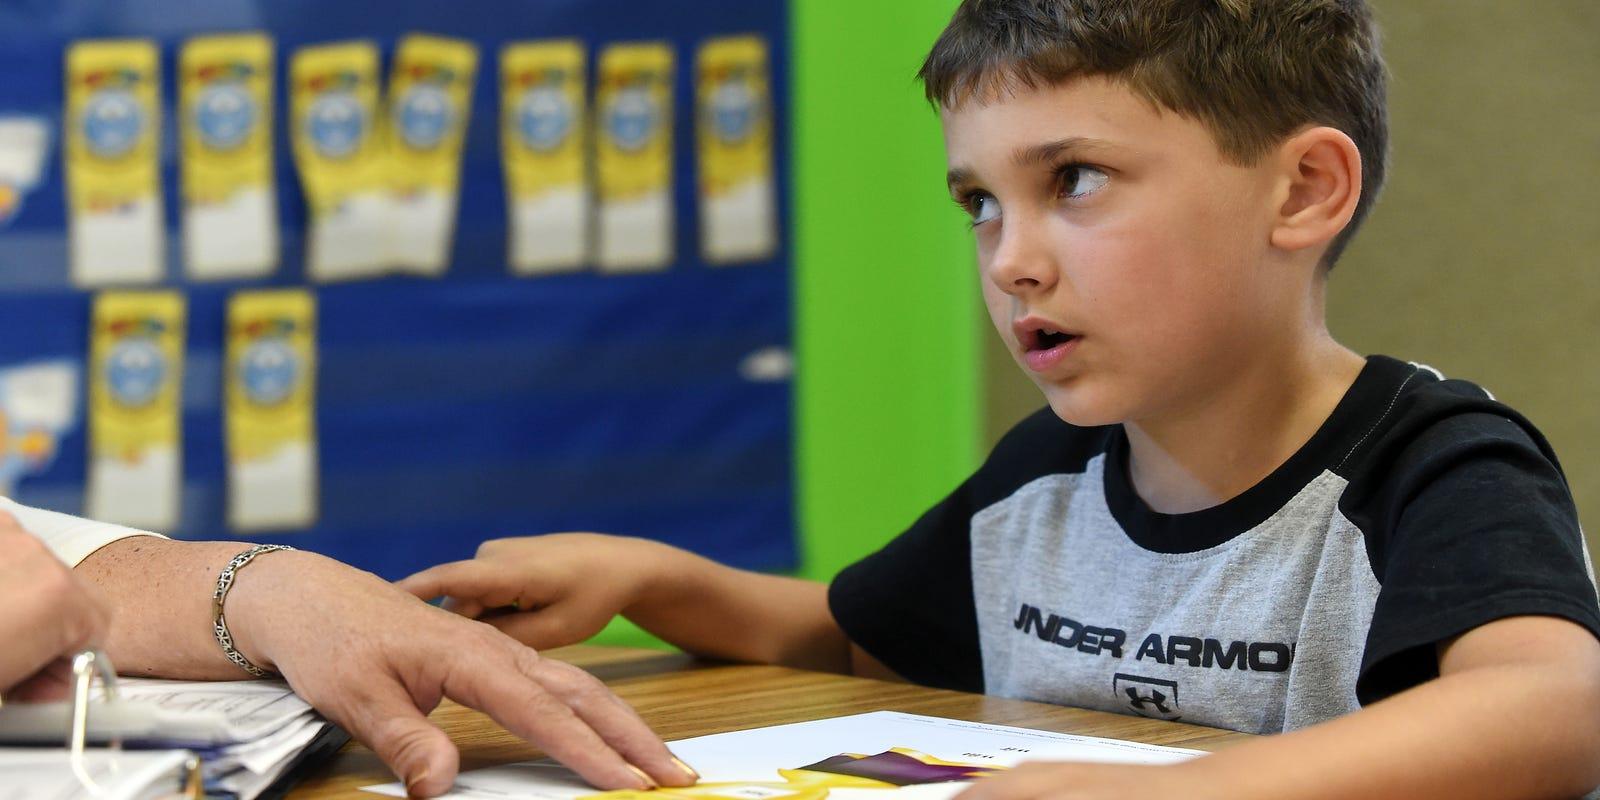 Flippin schools implement dyslexia intervention